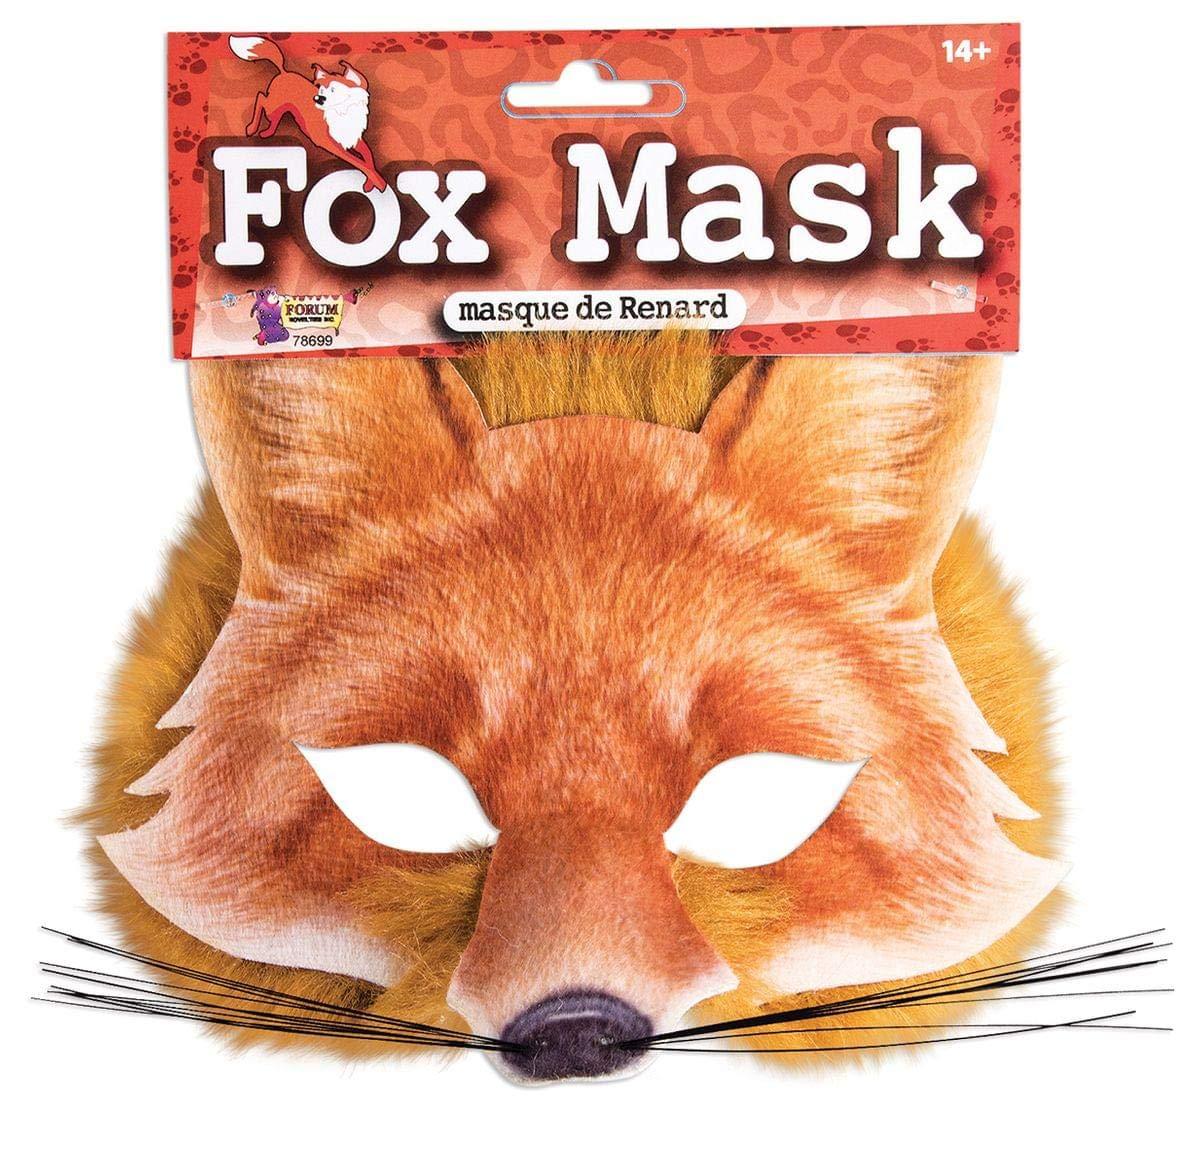 Forum Novelties 78699 Unisex-Adults Half Mask-Fox, Light Brown, Standard, One Size, Multicolor